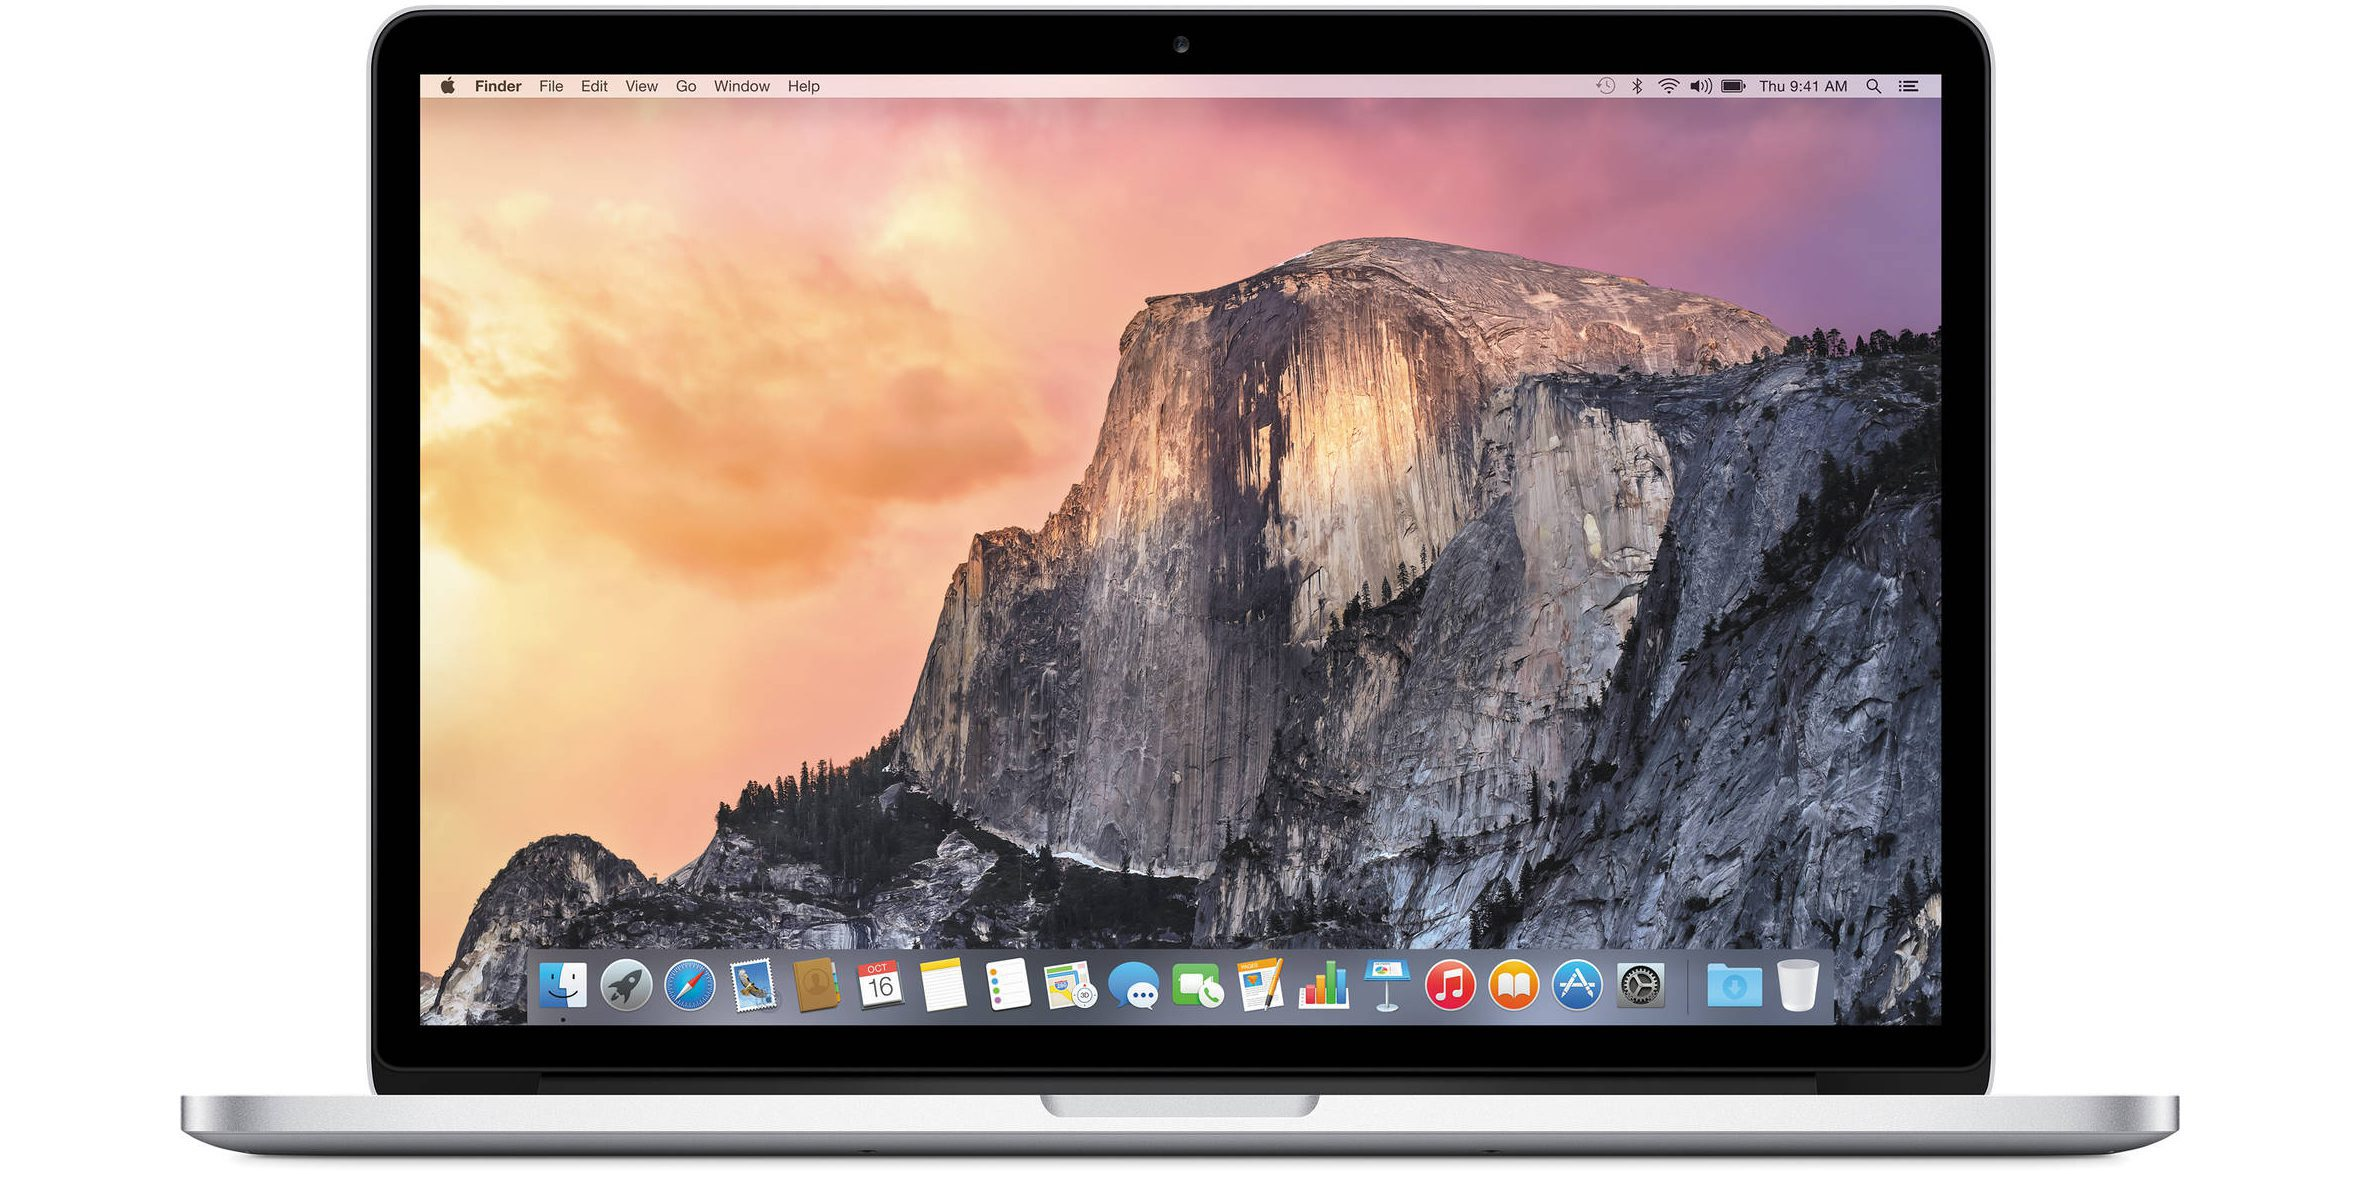 retina-macbook-ro15-inch-mjlq2lla (1)